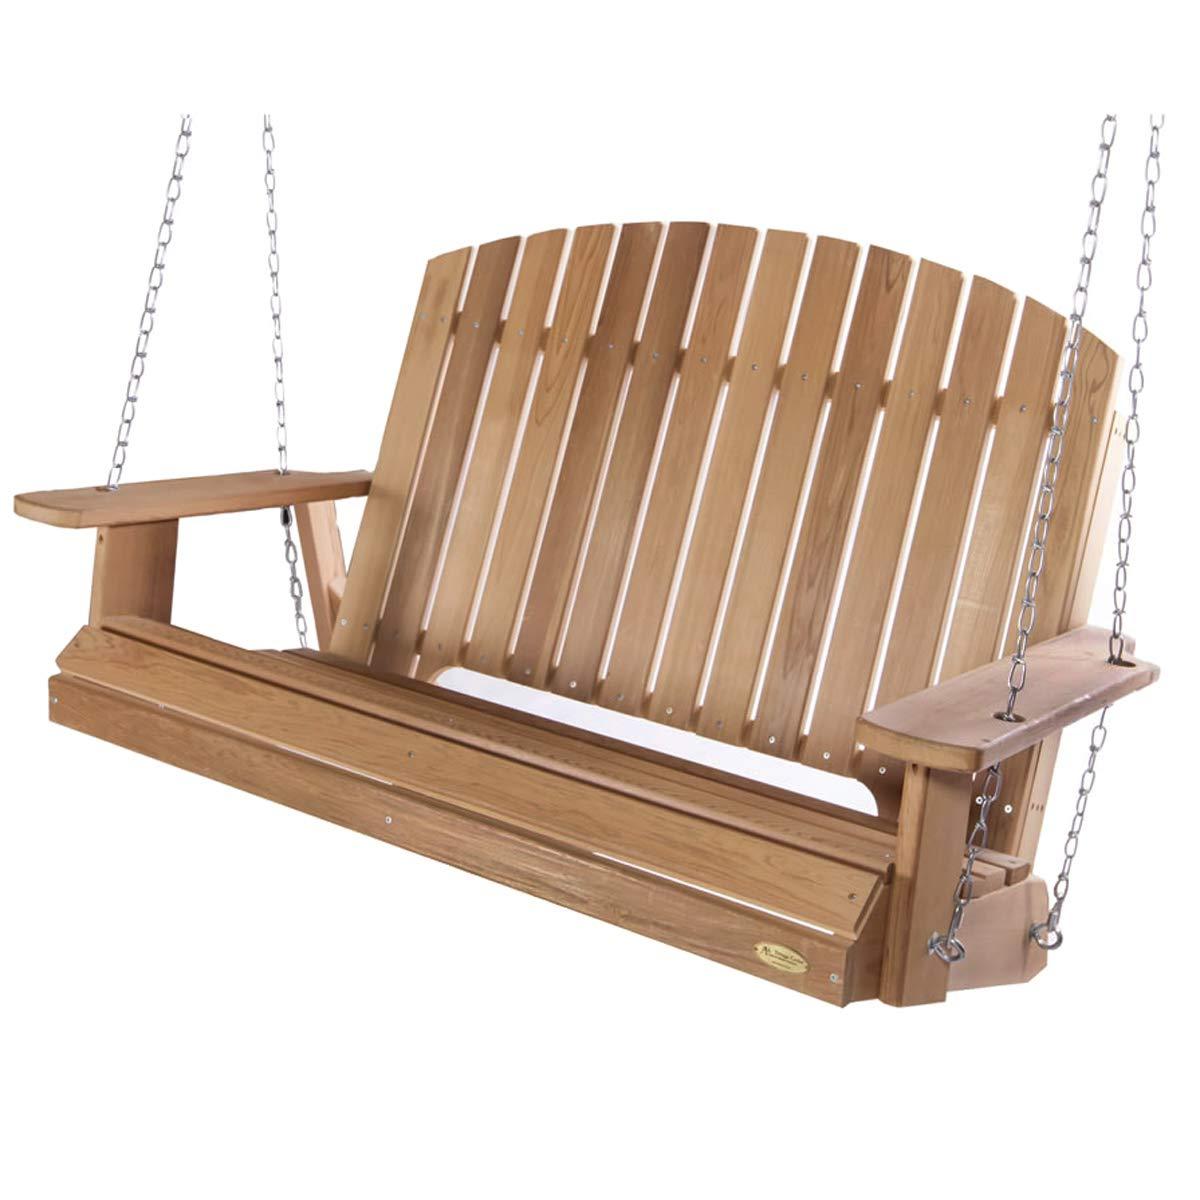 All Things Cedar Ps60 Sw10 5 Ft Cedar Garden Swing With Comfort Springs In Preferred A4 Ft Cedar Pergola Swings (View 9 of 30)